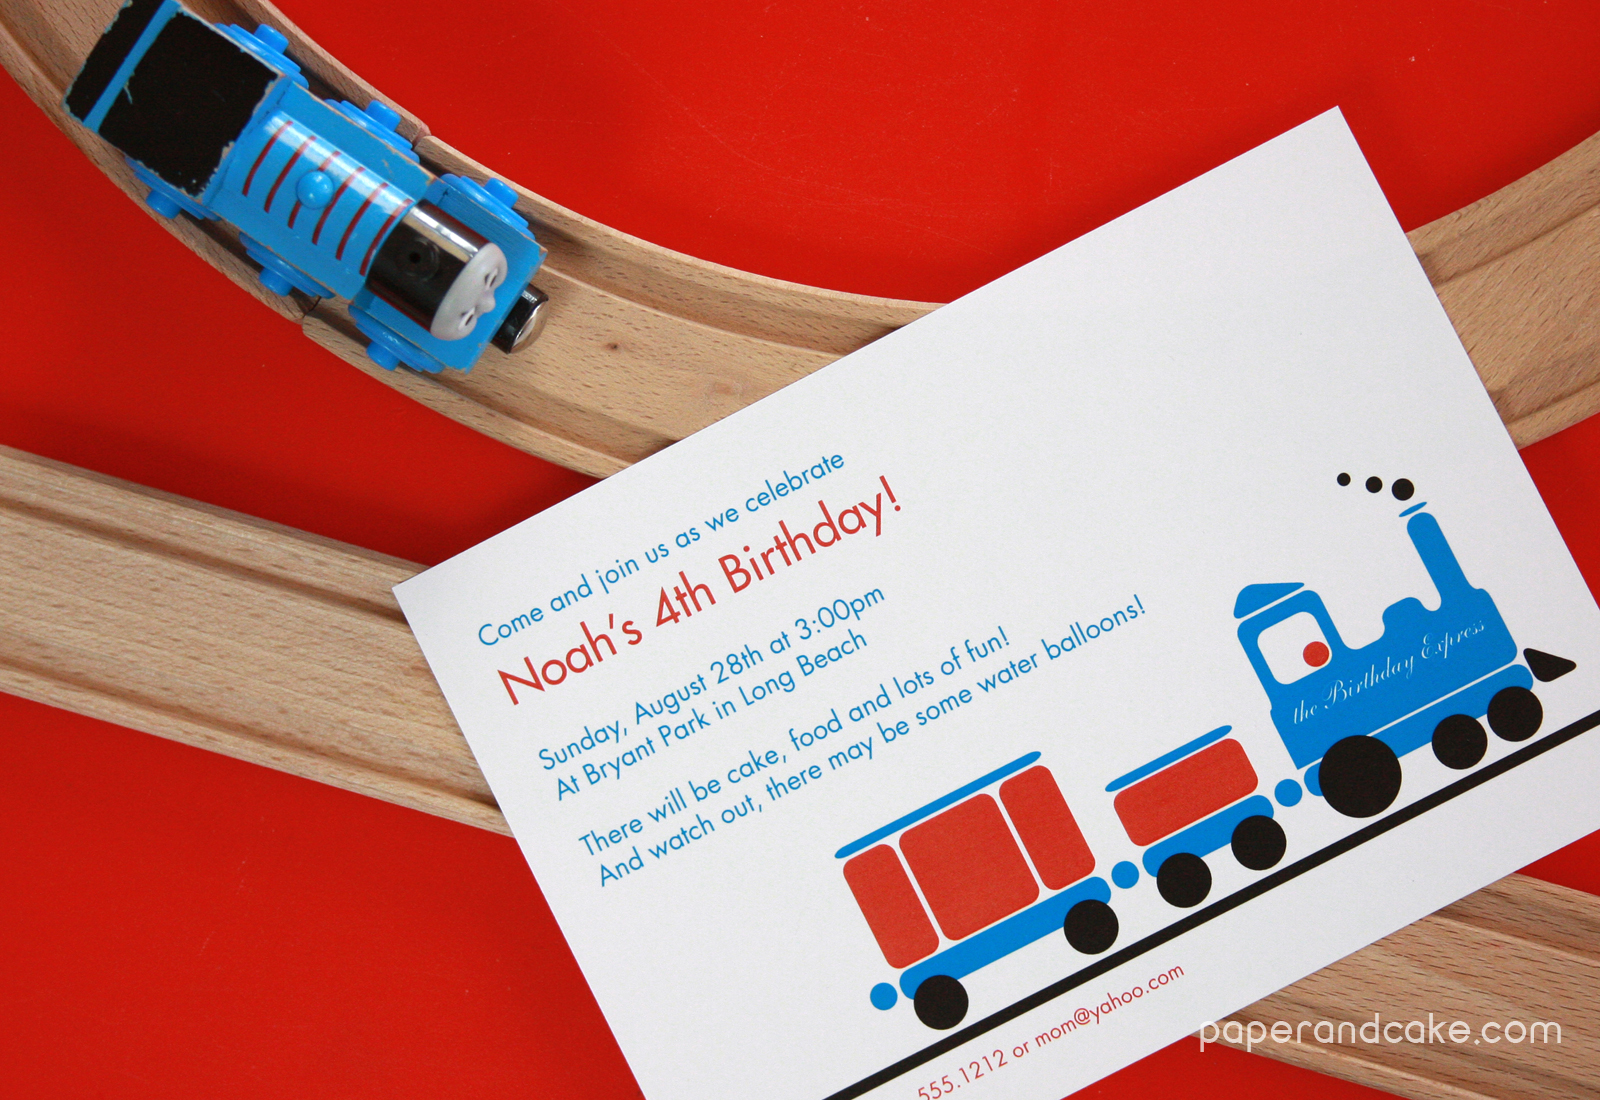 Free Thomas The Train Invitations with luxury invitations sample